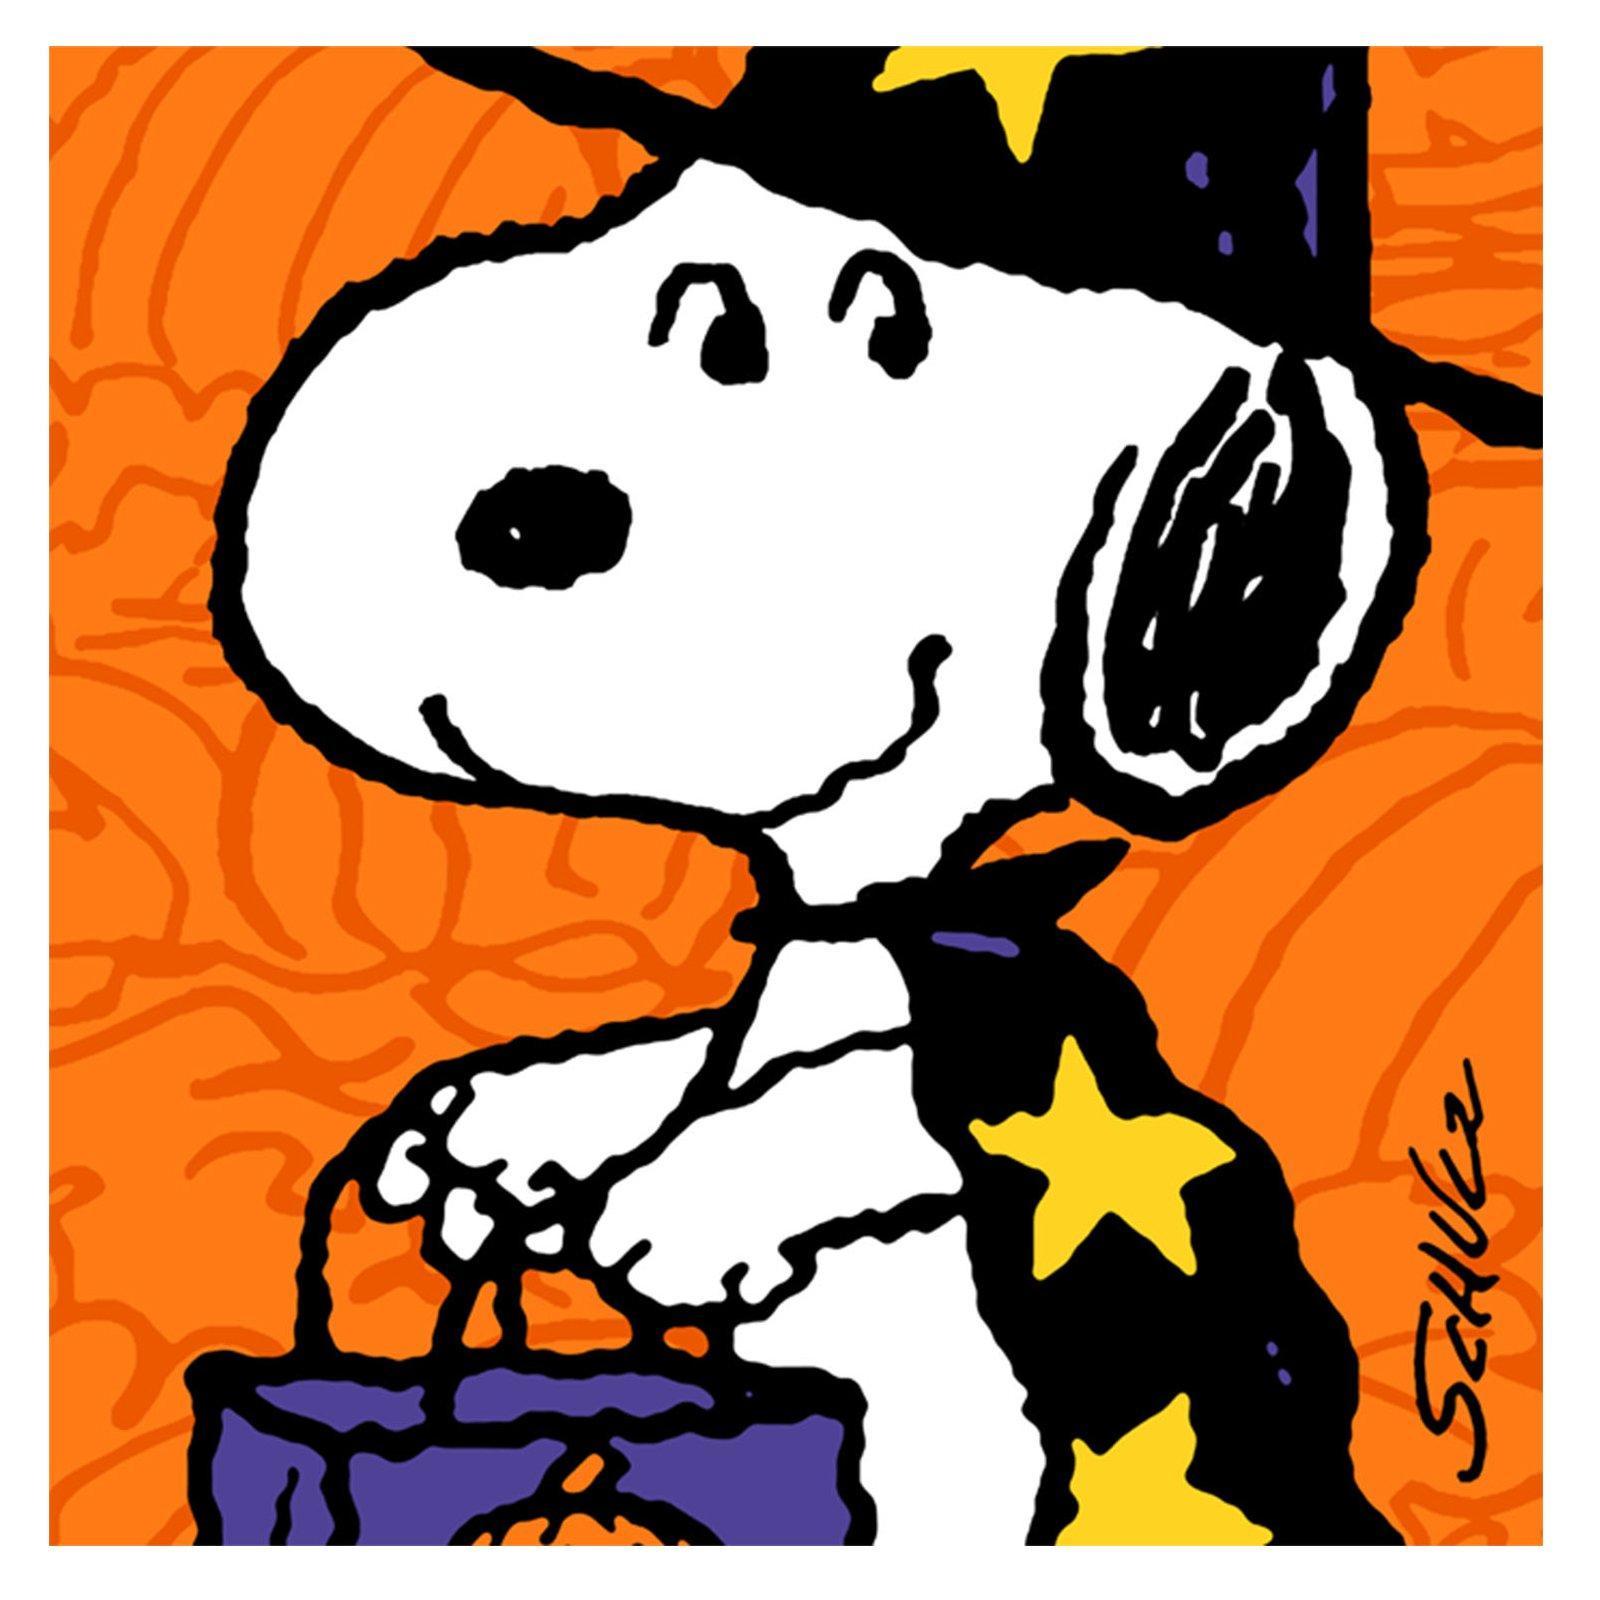 Snoopy Halloween Wallpapers - Wallpaper Cave